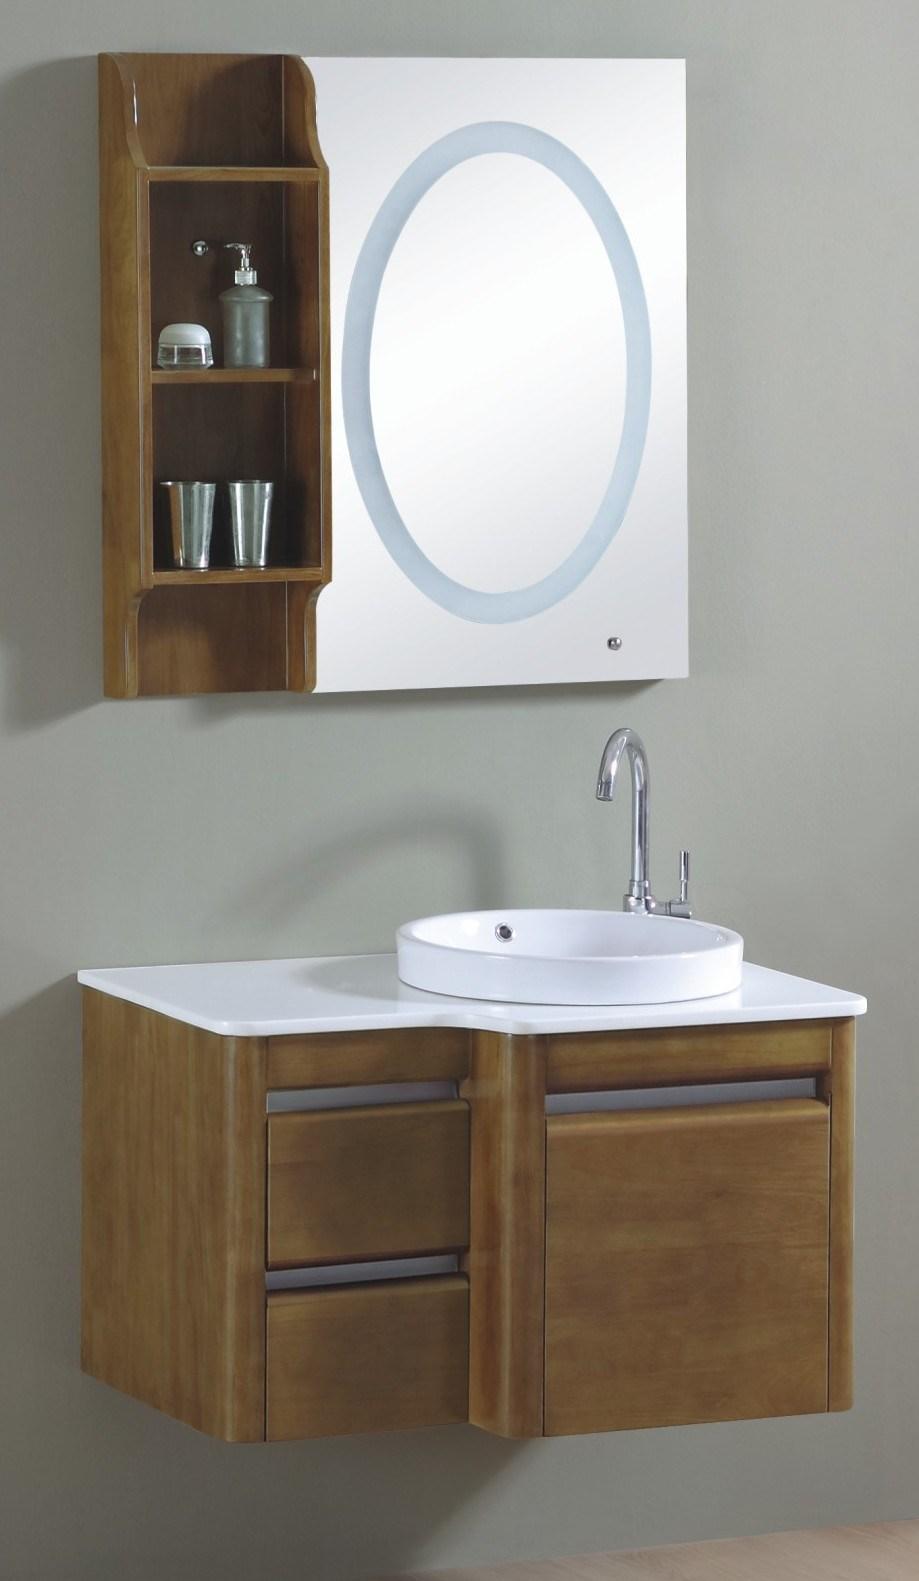 Armario De Parede Para Banheiro Pequeno : Arm?rios de banheiro madeira fixados na parede do ?nico